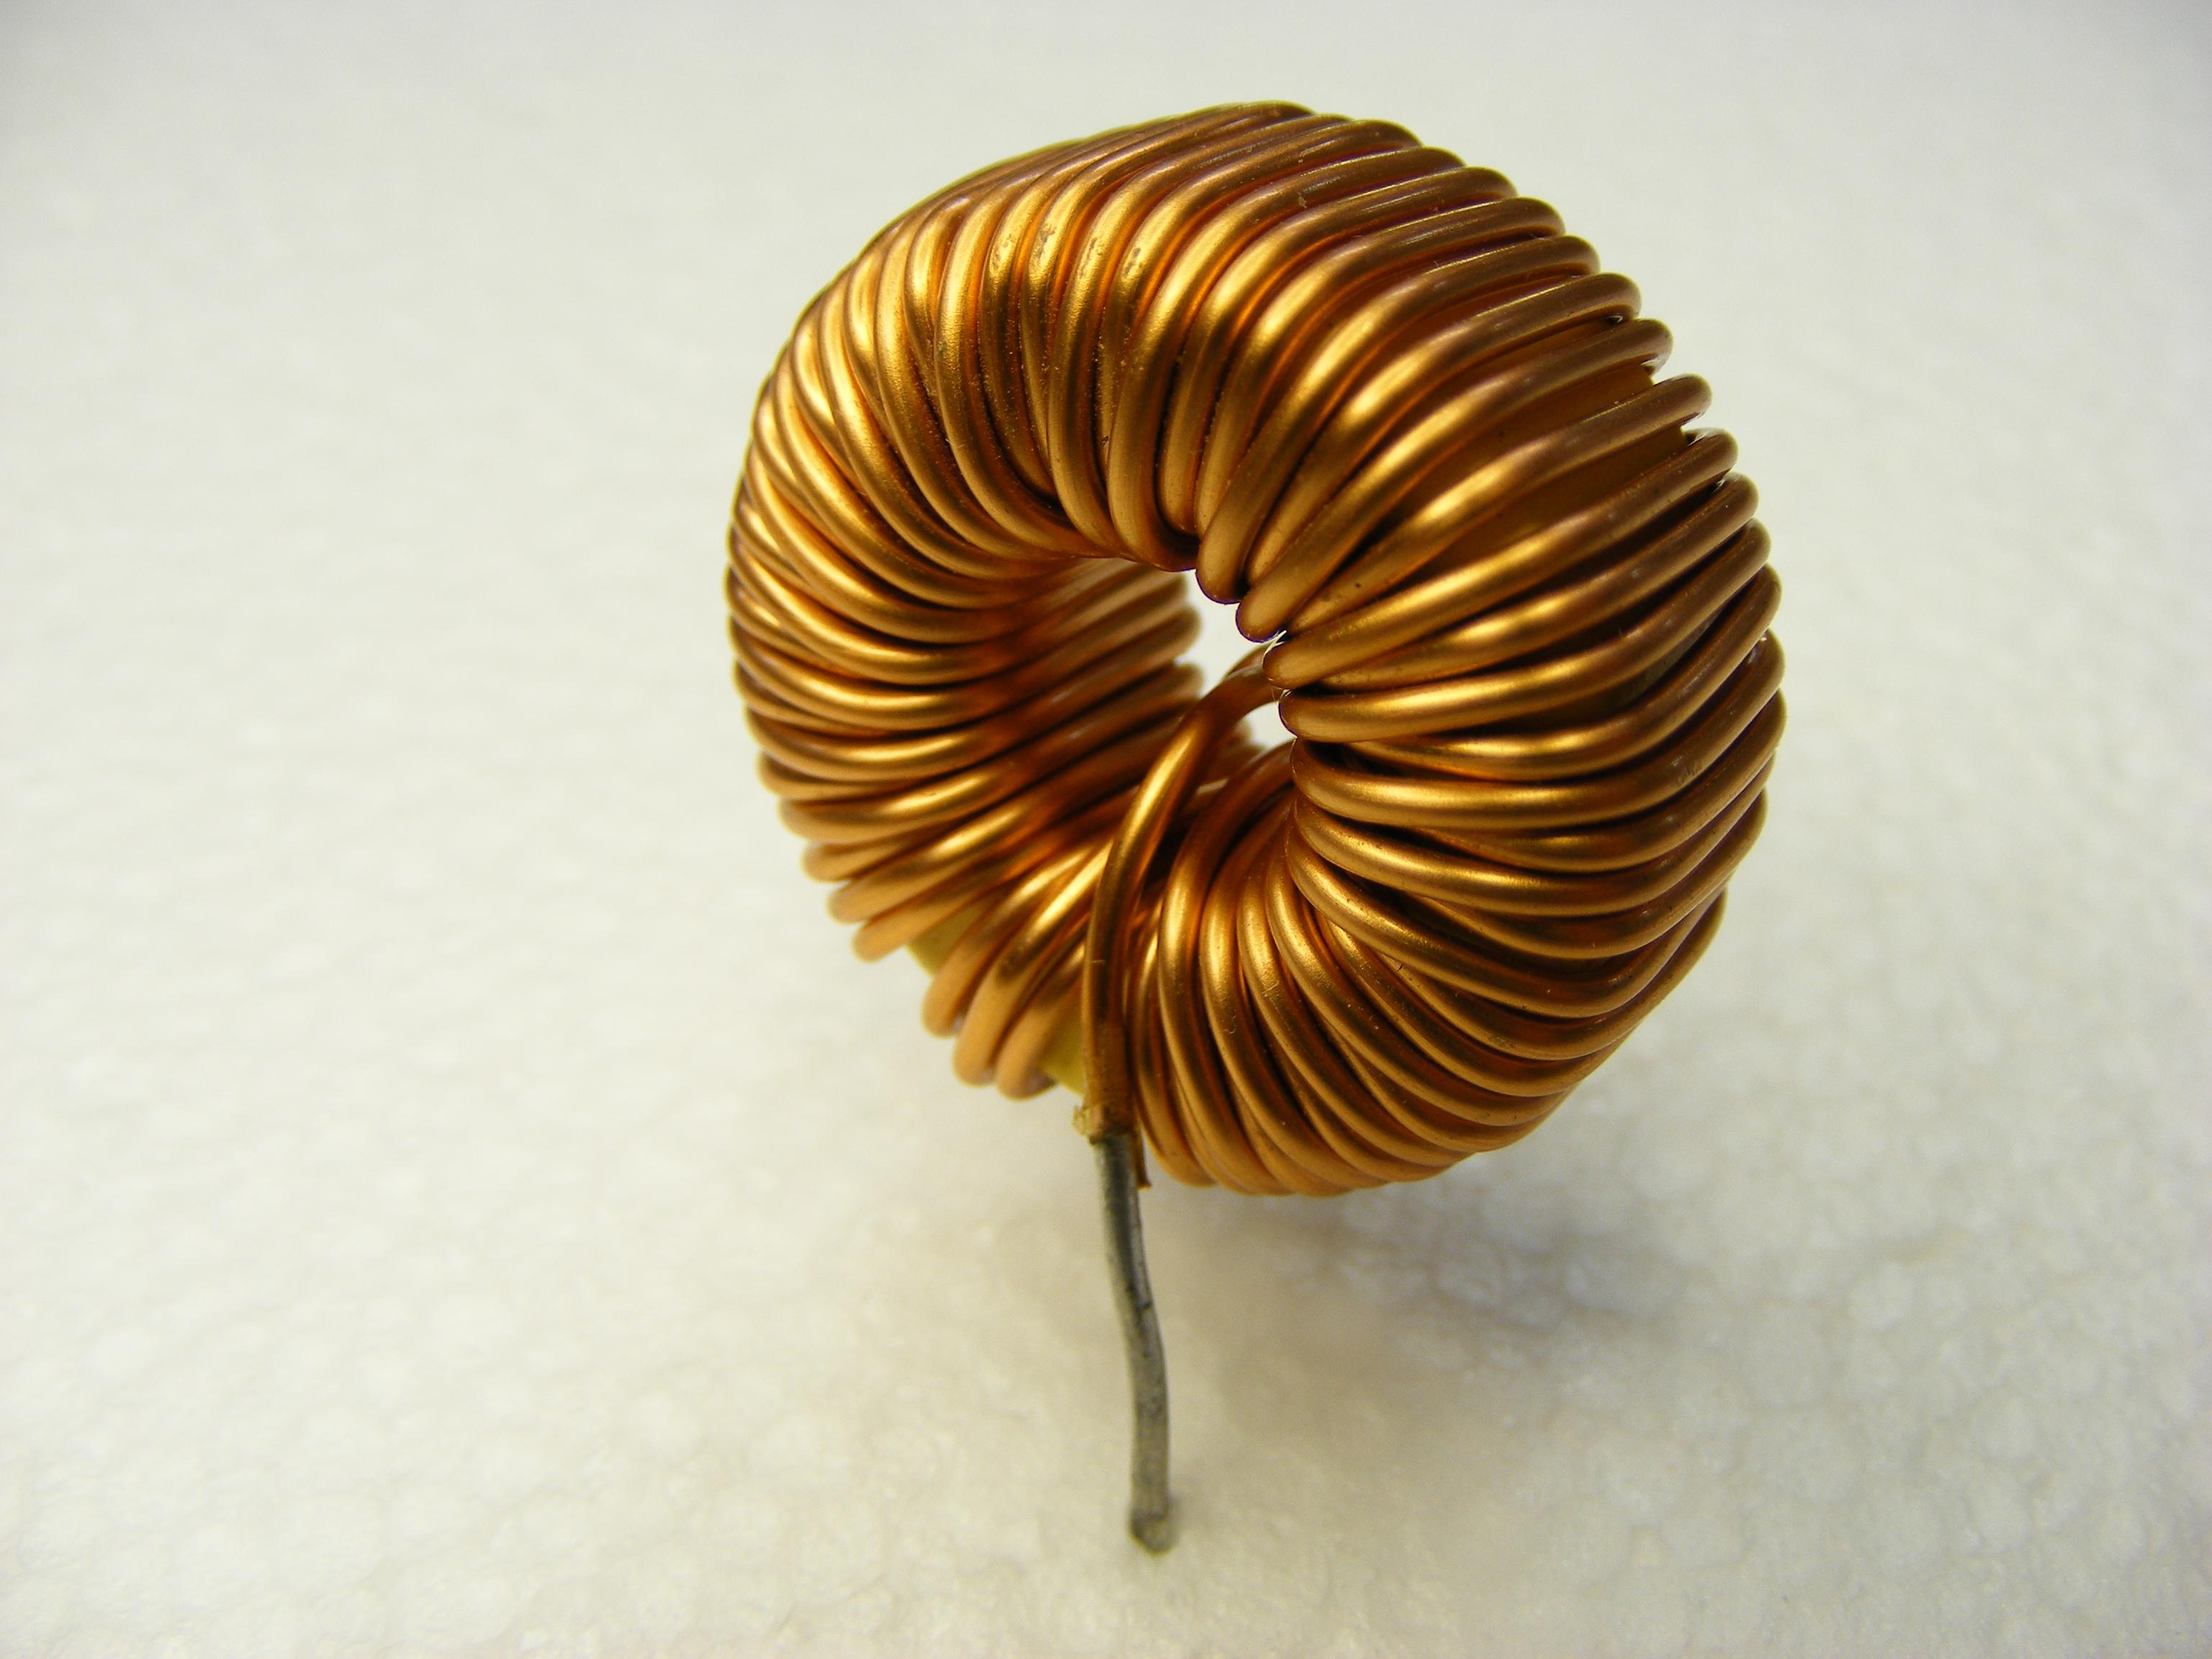 File:Toroidal inductor.jpg - Wikimedia Commons